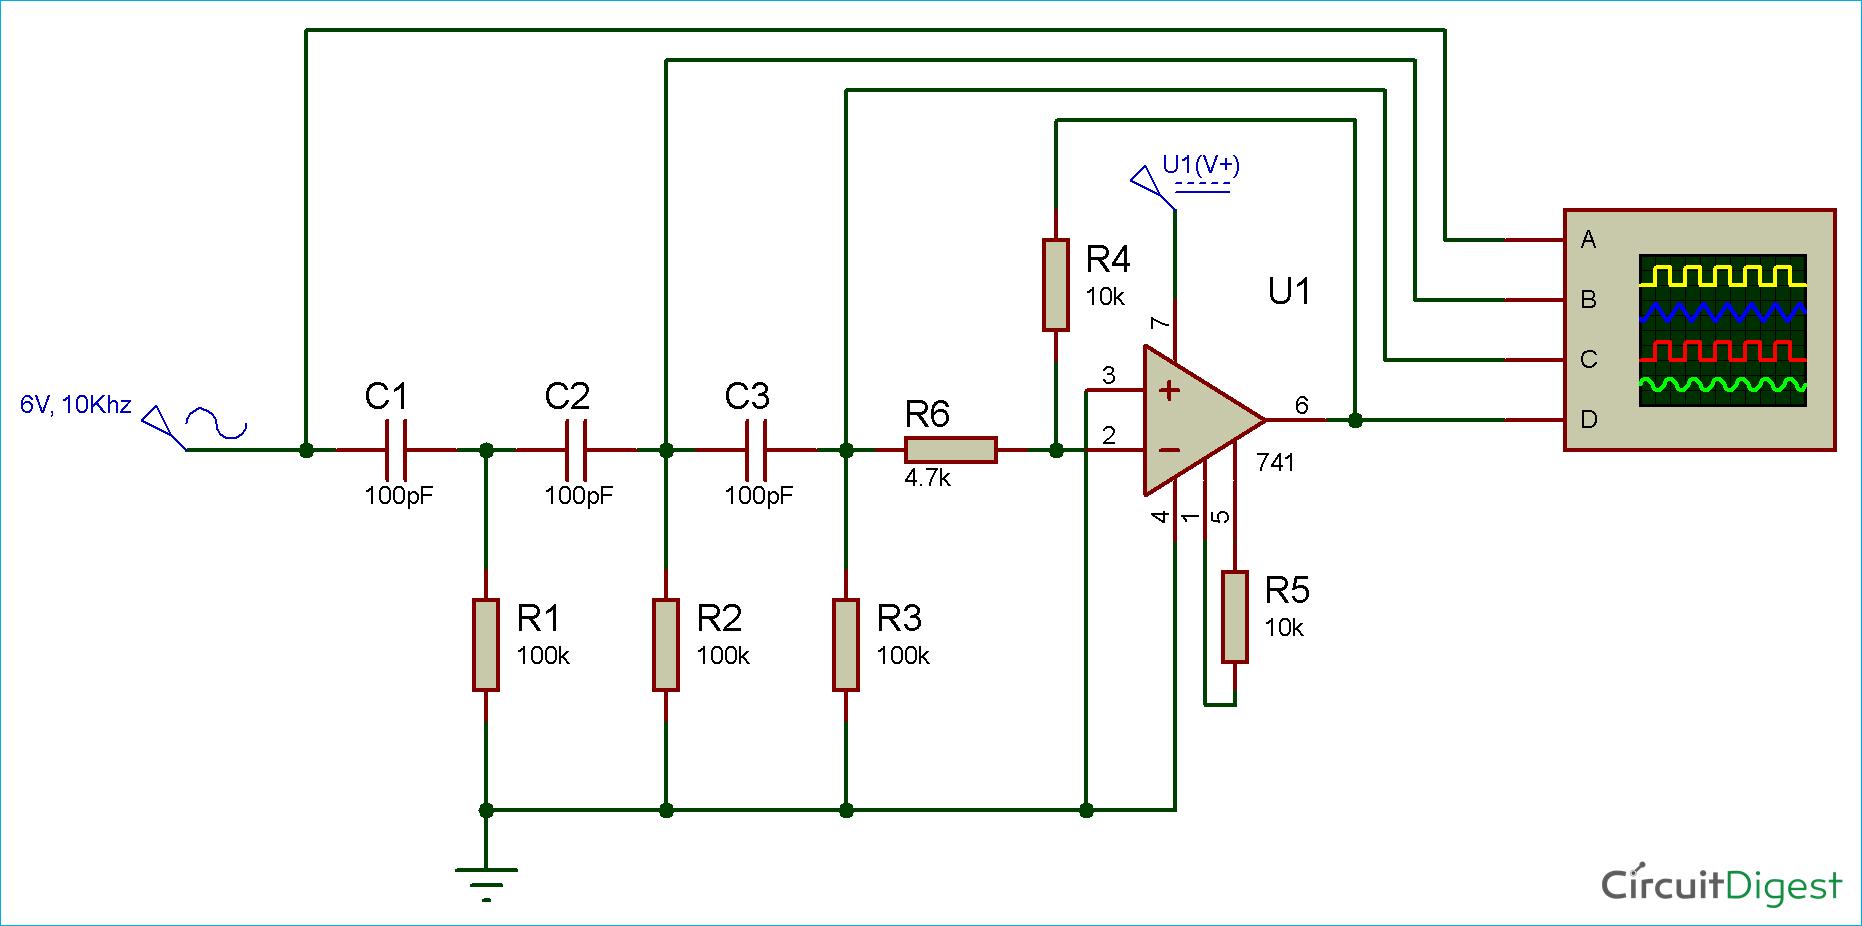 medium resolution of circuit diagram for rc phase shift oscillator using op amp